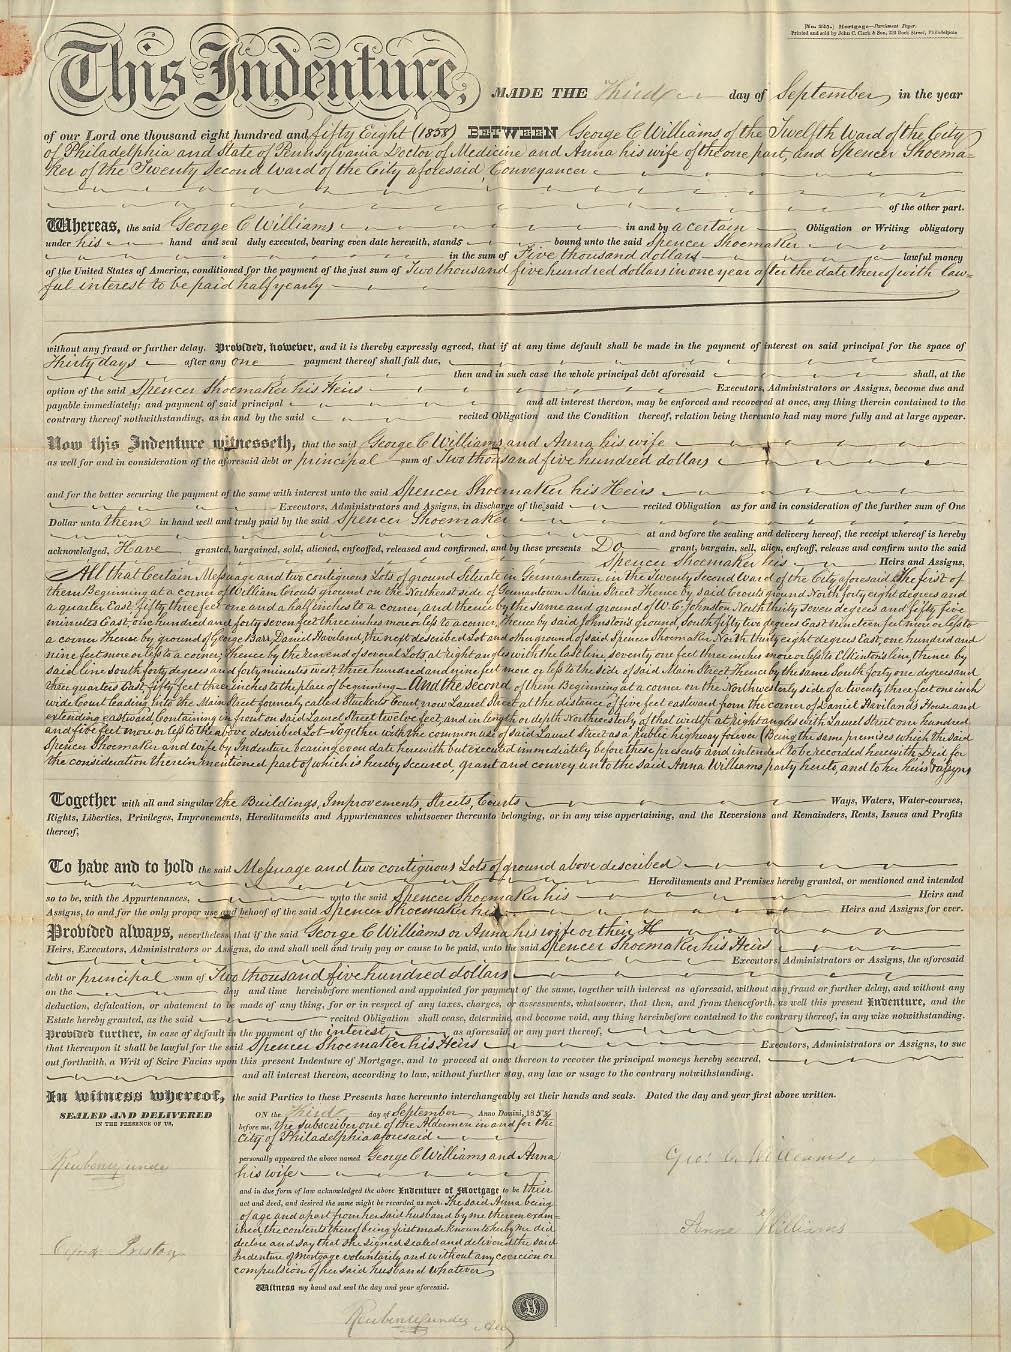 1858 Mortgage George C Williams & Wife to Spencer Shoemaker Philadelphia